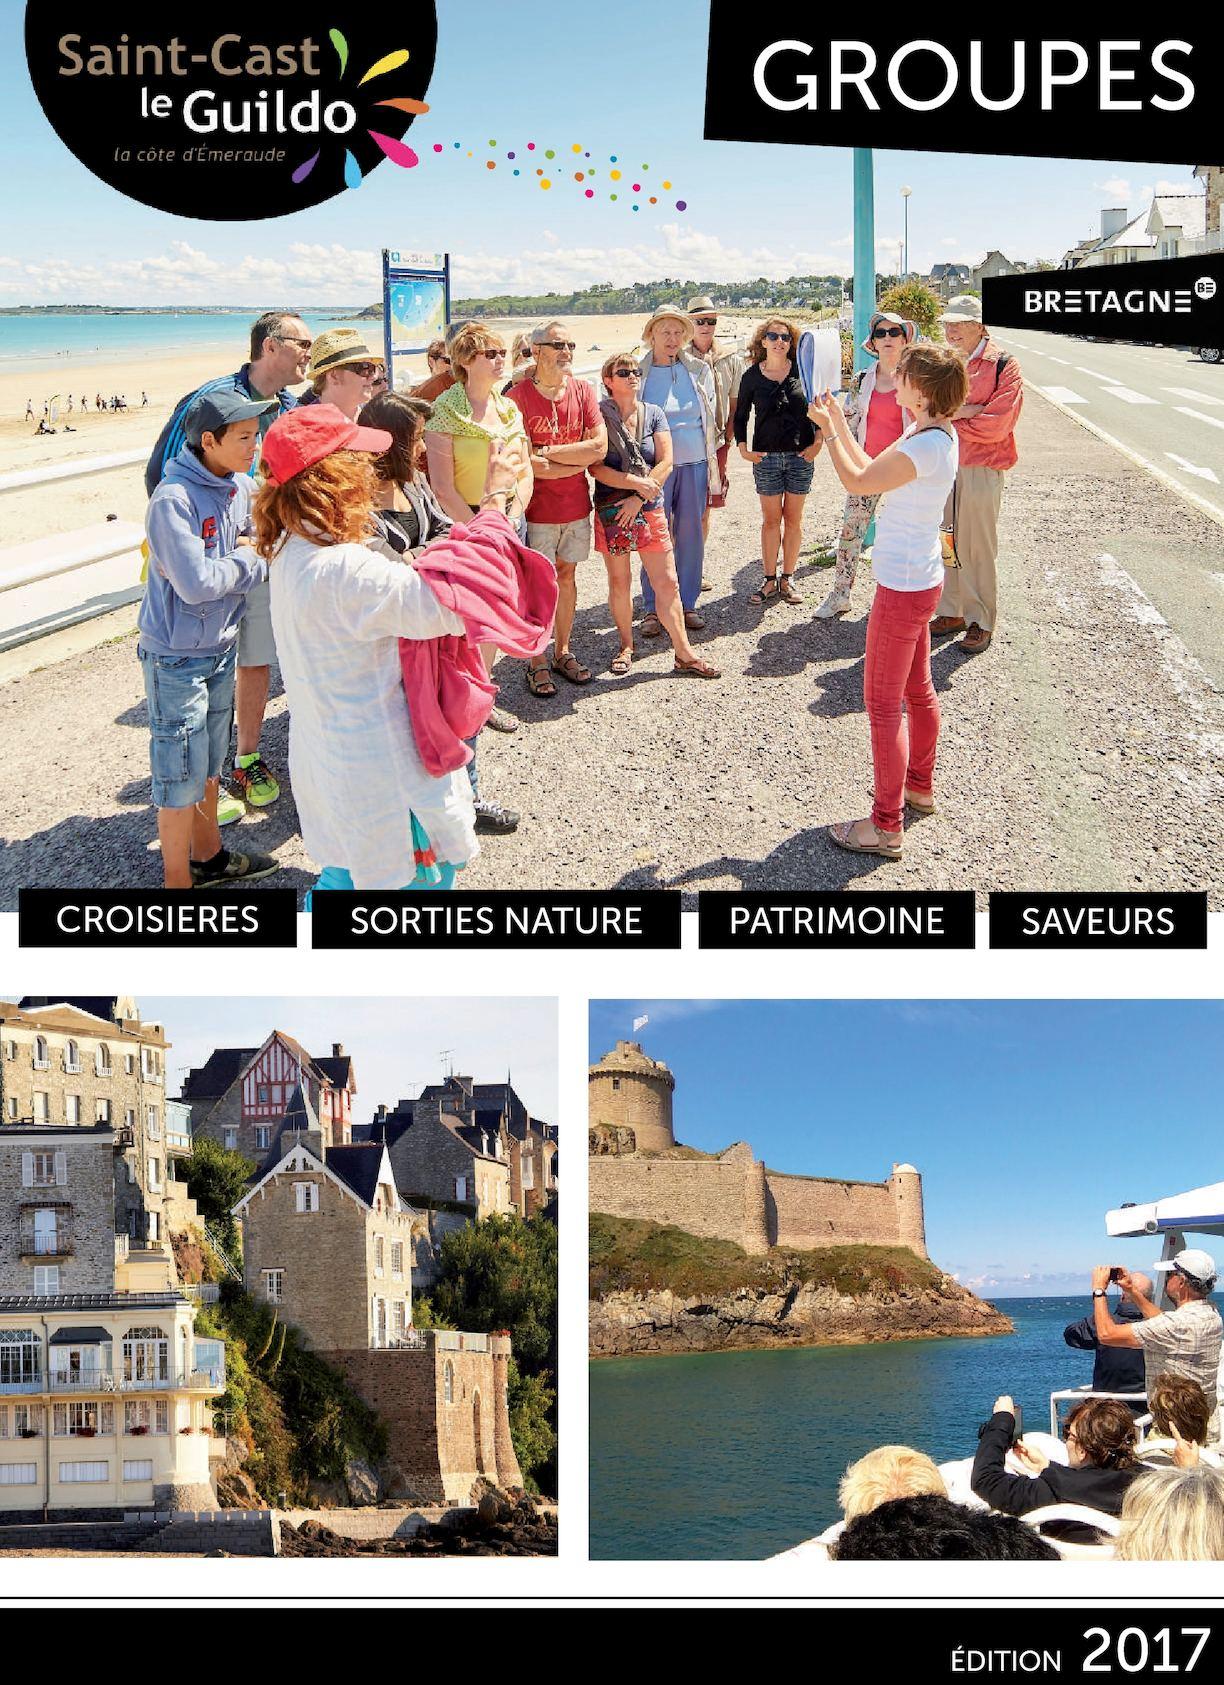 Calam o brochure groupes 2017 saint cast le guildo - Office du tourisme saint cast le guildo ...